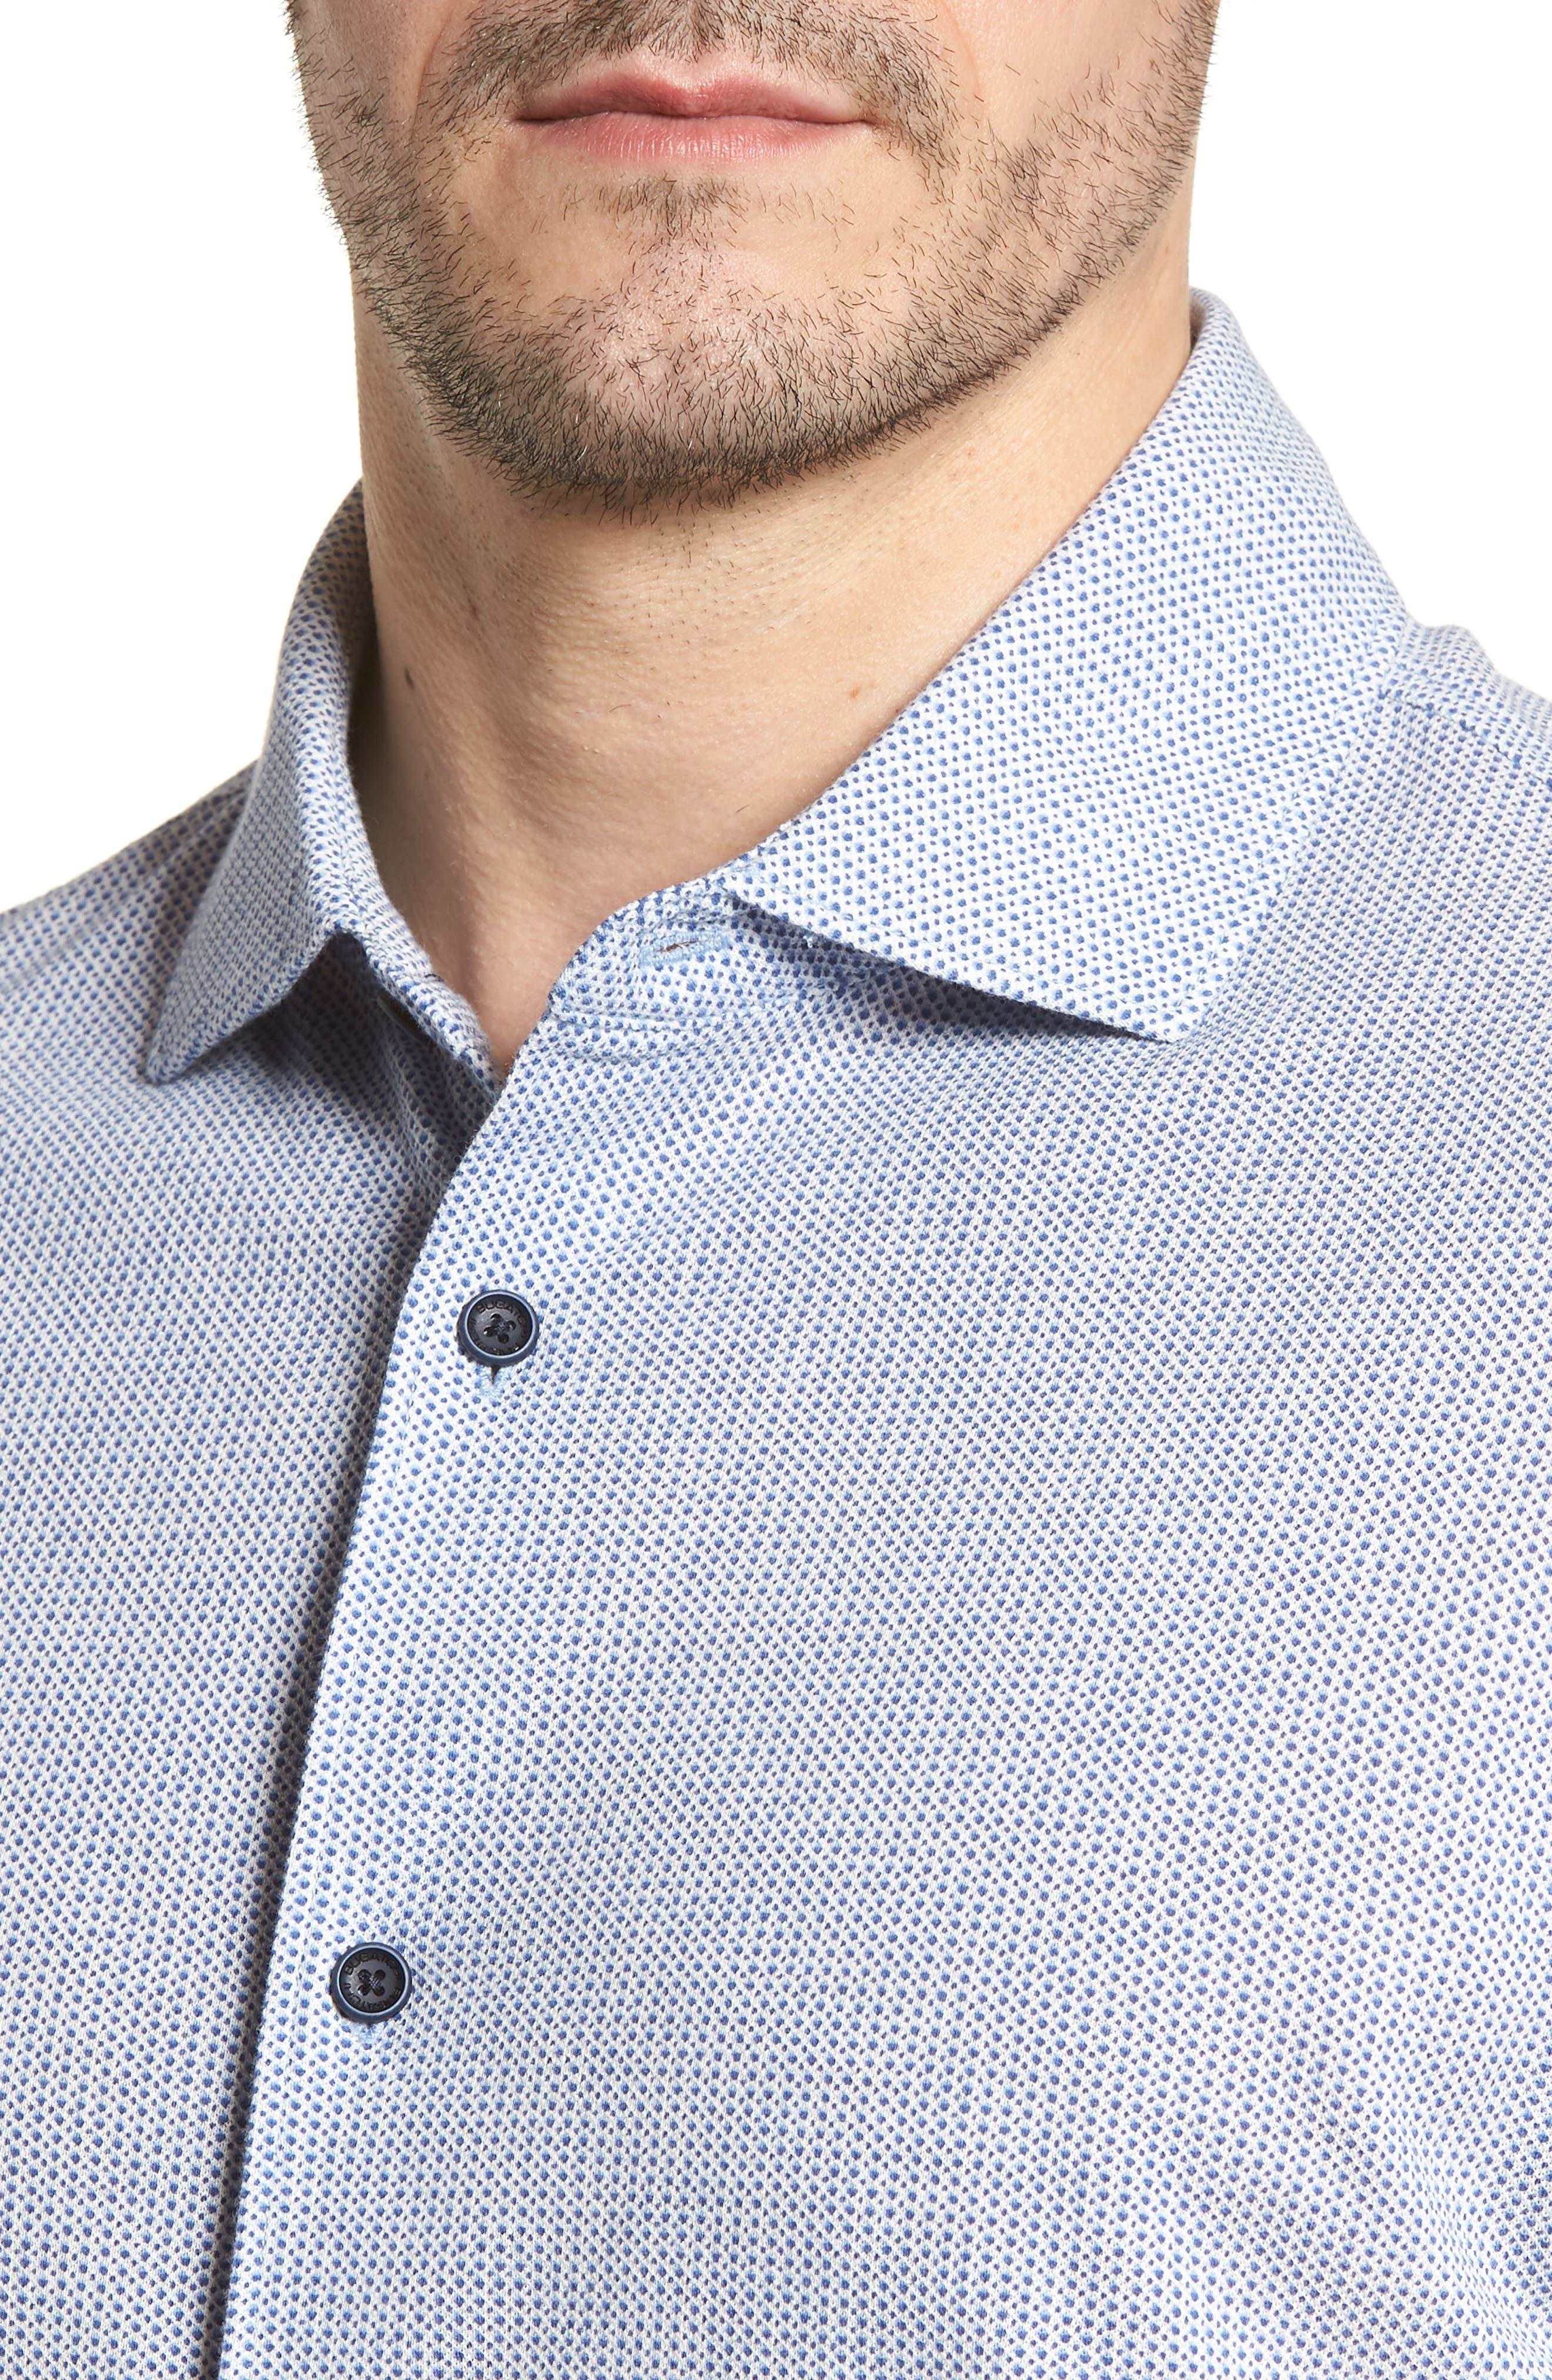 BUGATCHI,                             Shaped Fit Microprint Sport Shirt,                             Alternate thumbnail 4, color,                             CLASSIC BLUE